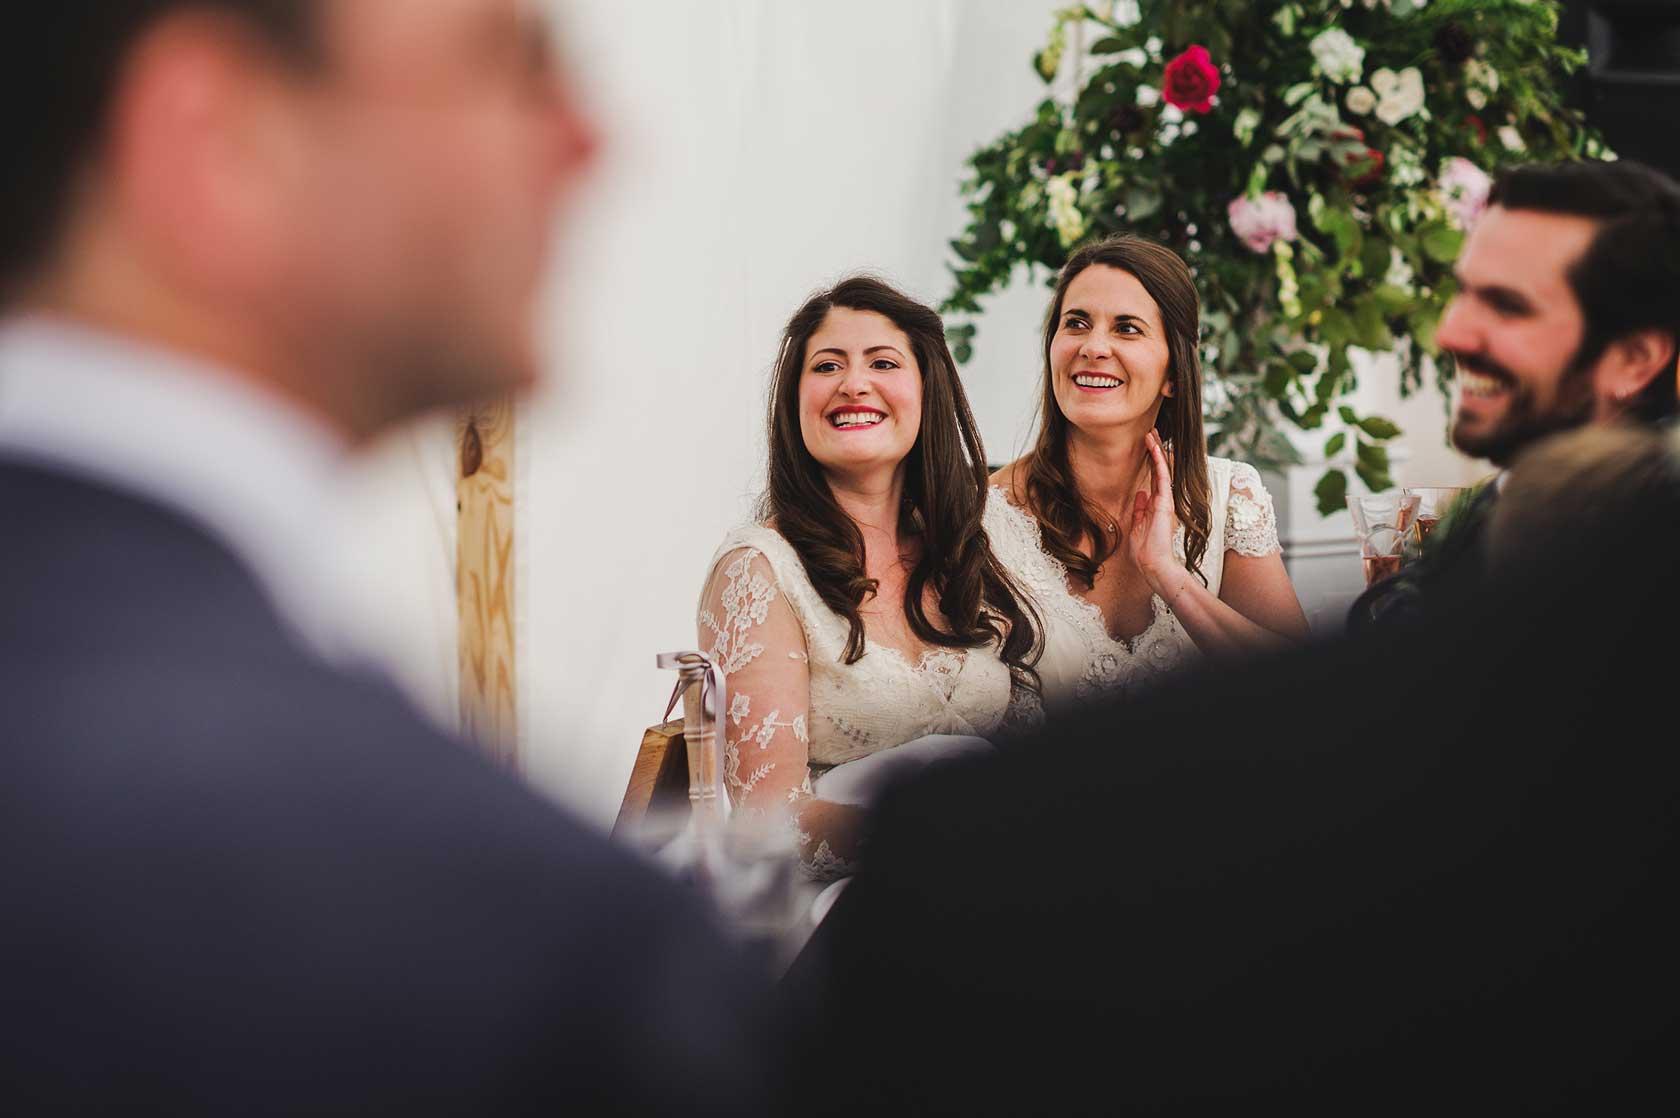 Reportage Wedding Photography at Barnsley House